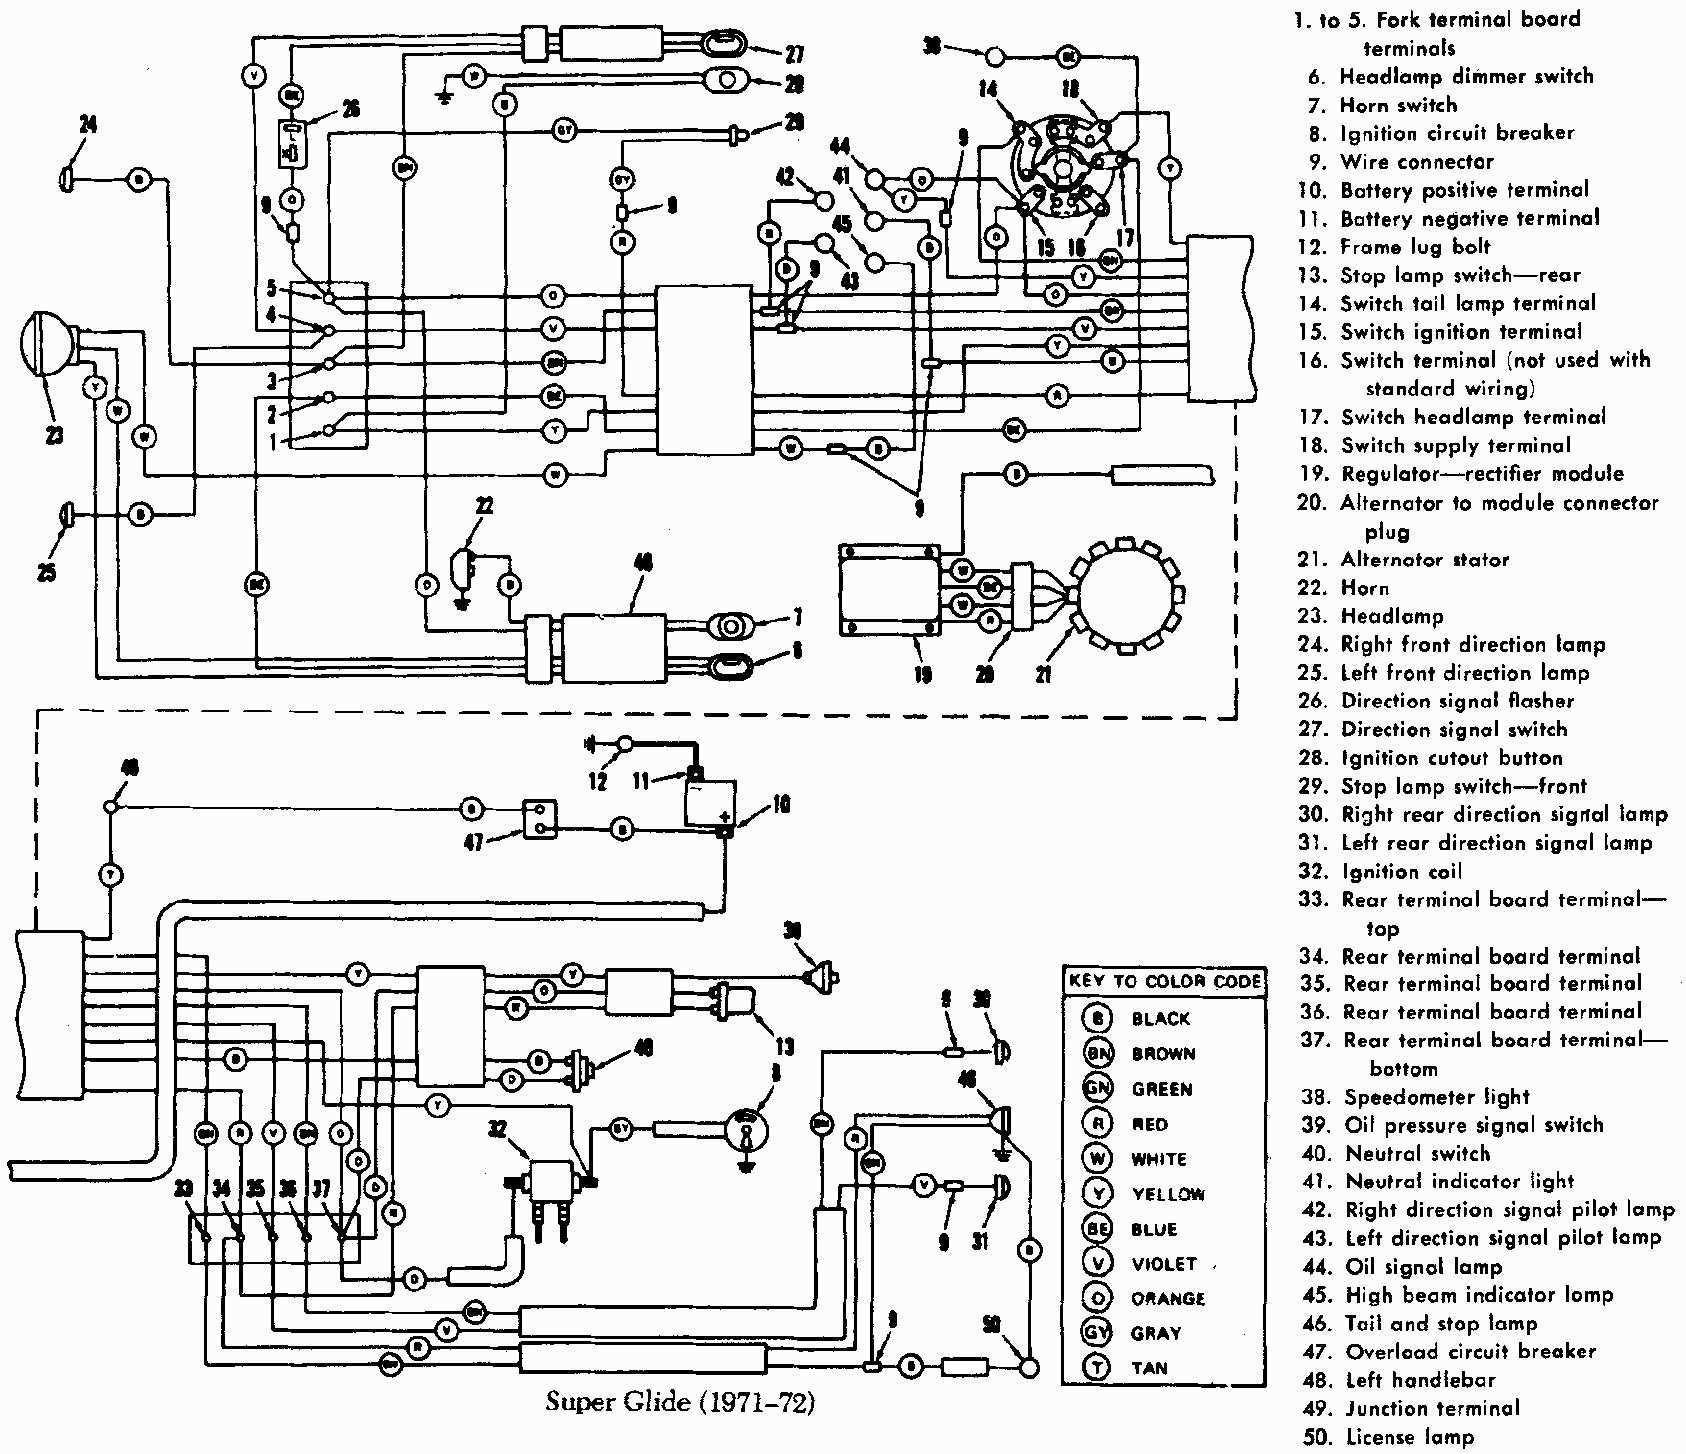 Diagramme Harley Davidson Golf Cart Electrical Diagram Full Version Hd Quality Electrical Diagram Solastructures Puntimpresa It